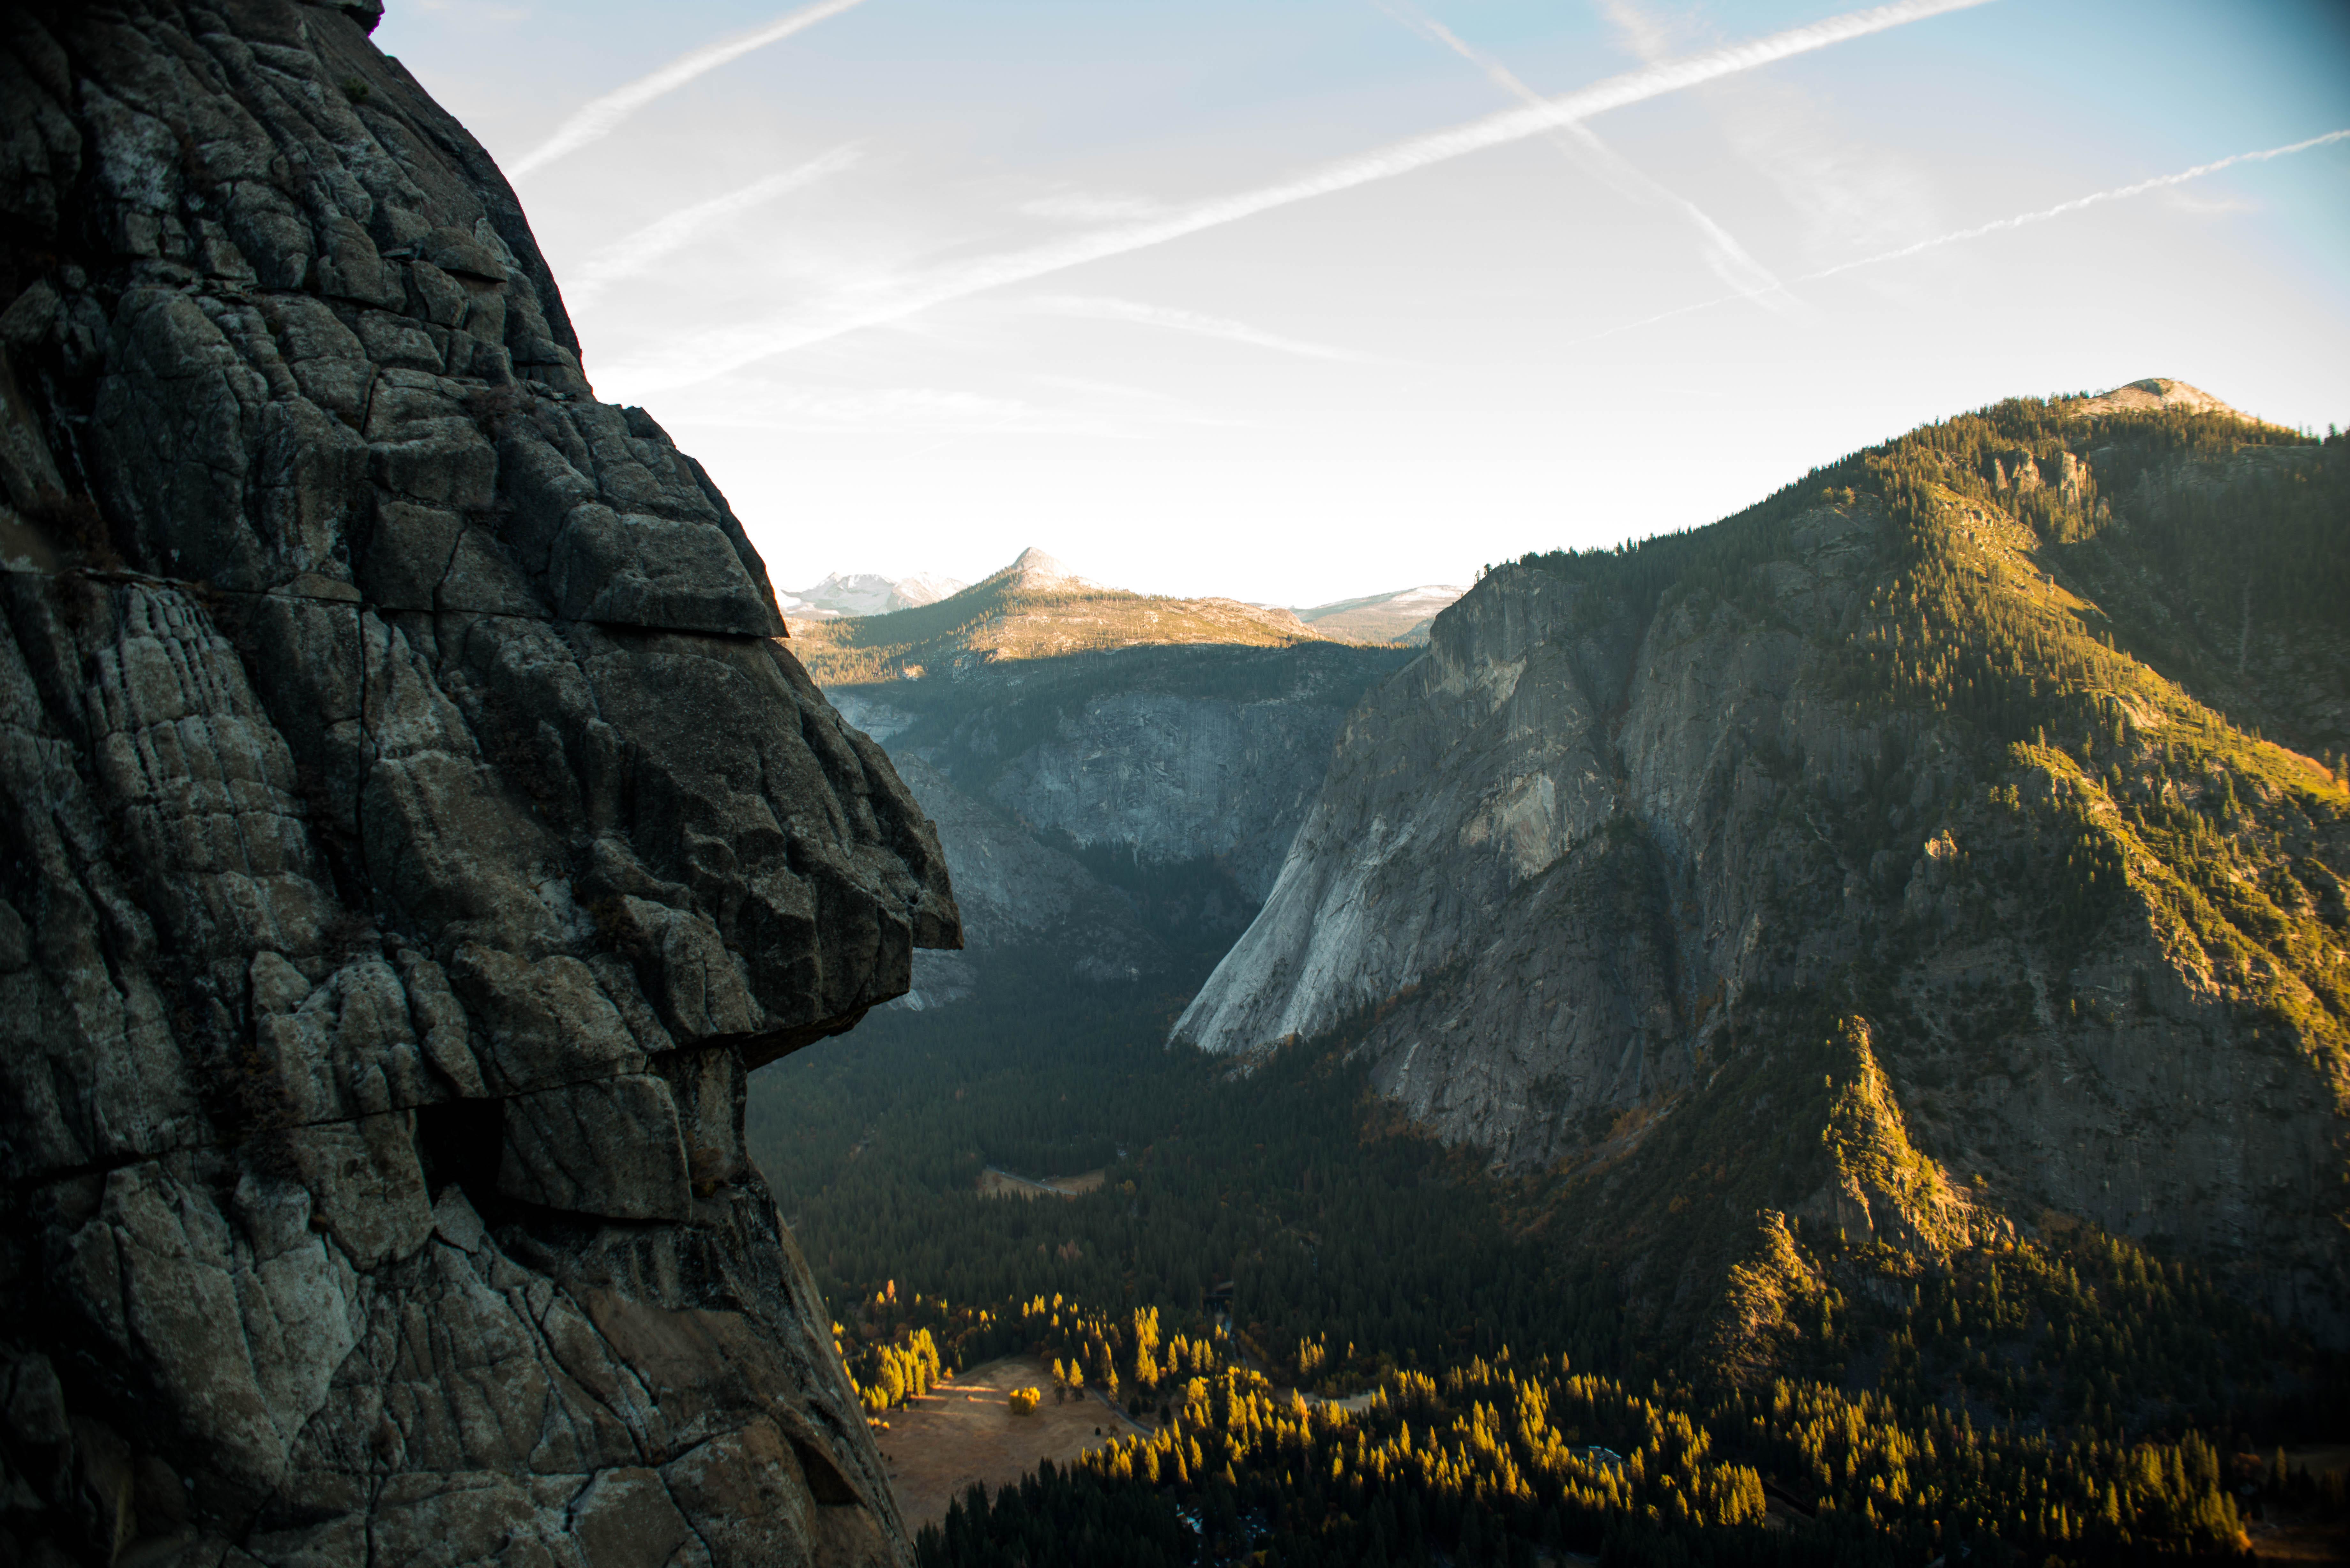 Upper Yosemite Falls Trail, 2015